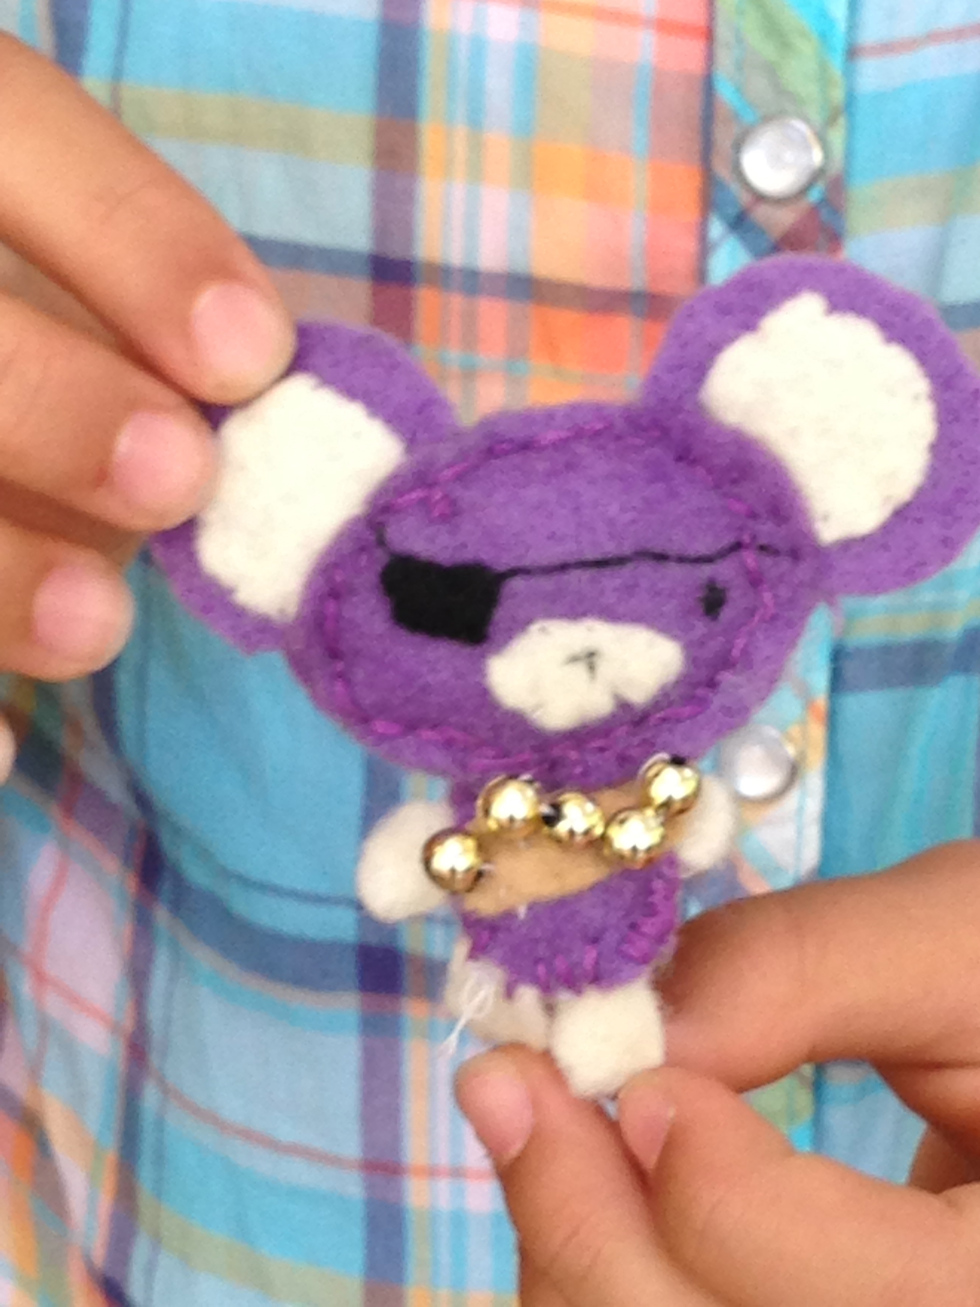 5th grader tiny felt pirate mouse.